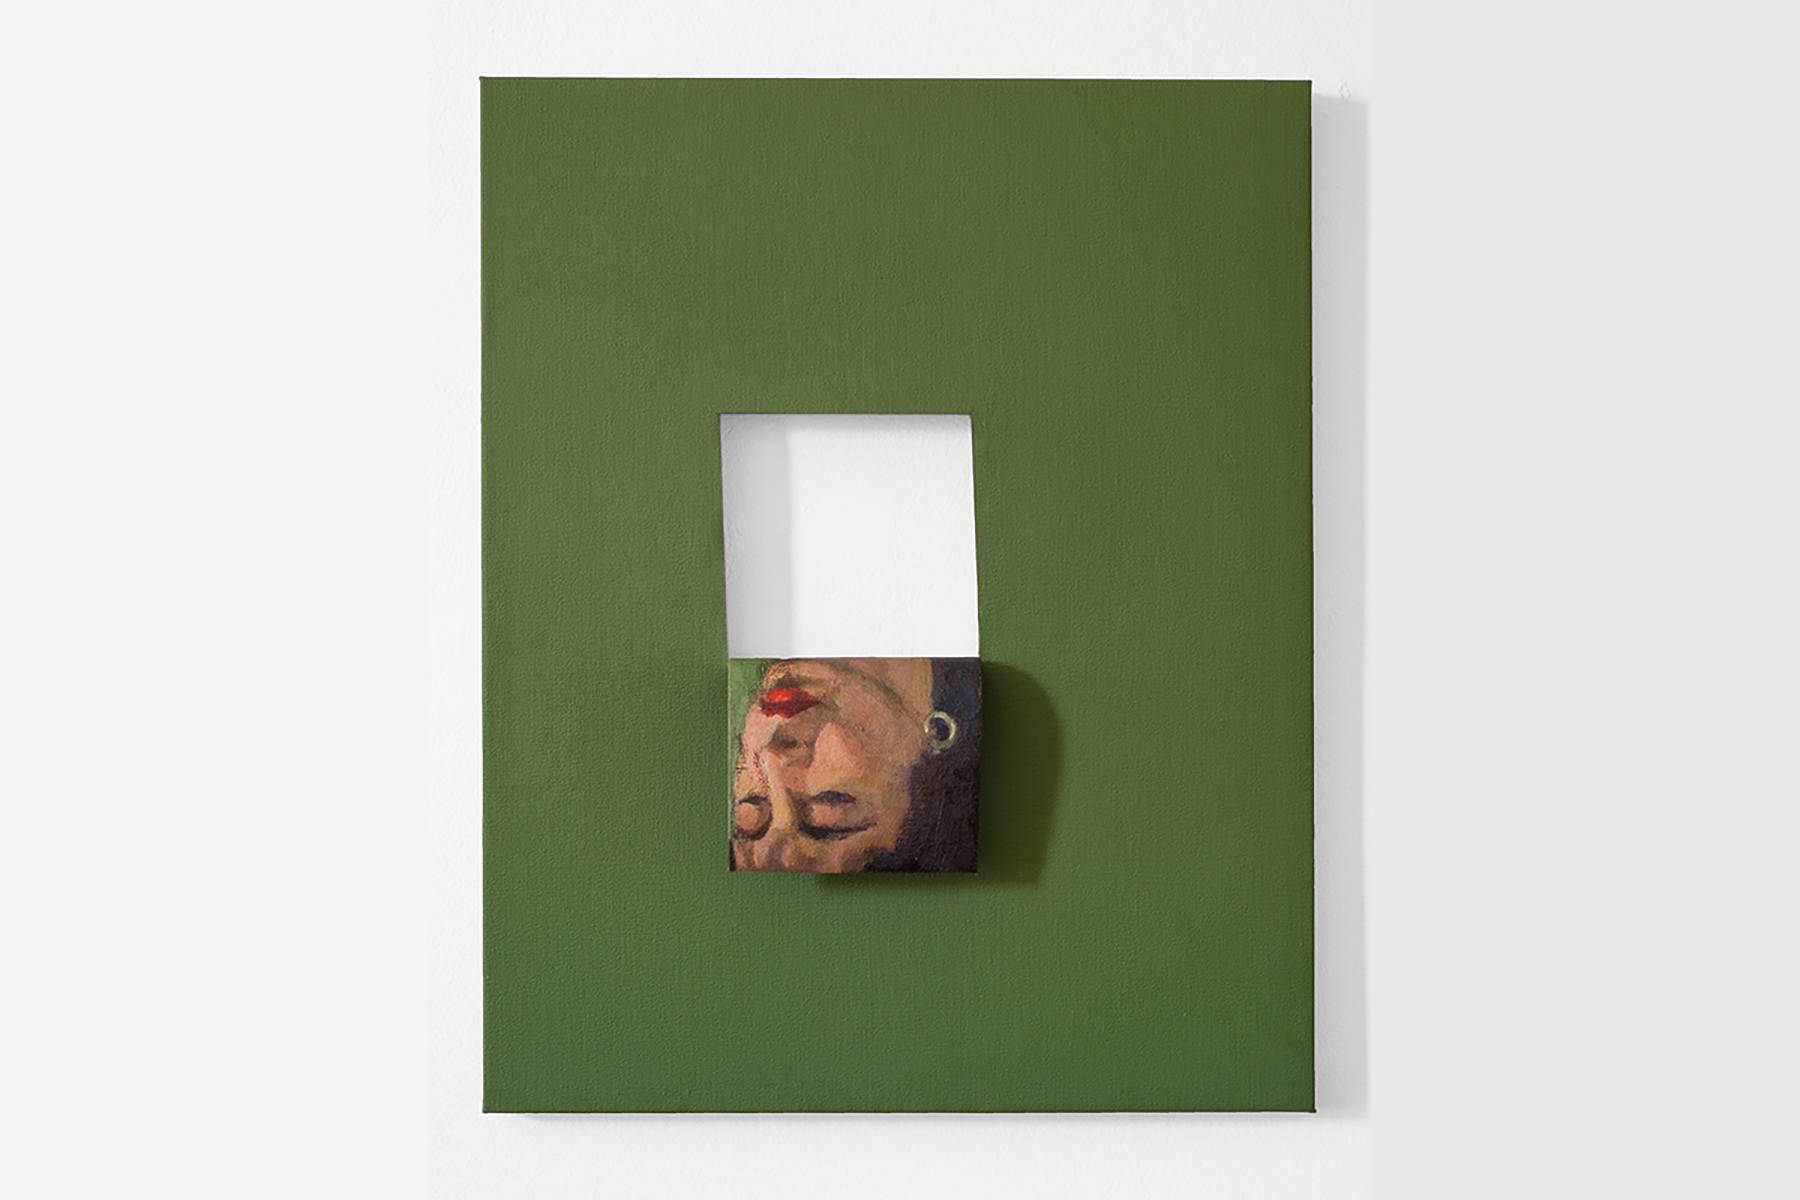 IGNANT-Art-Valeska-Soares-Doubleface-5